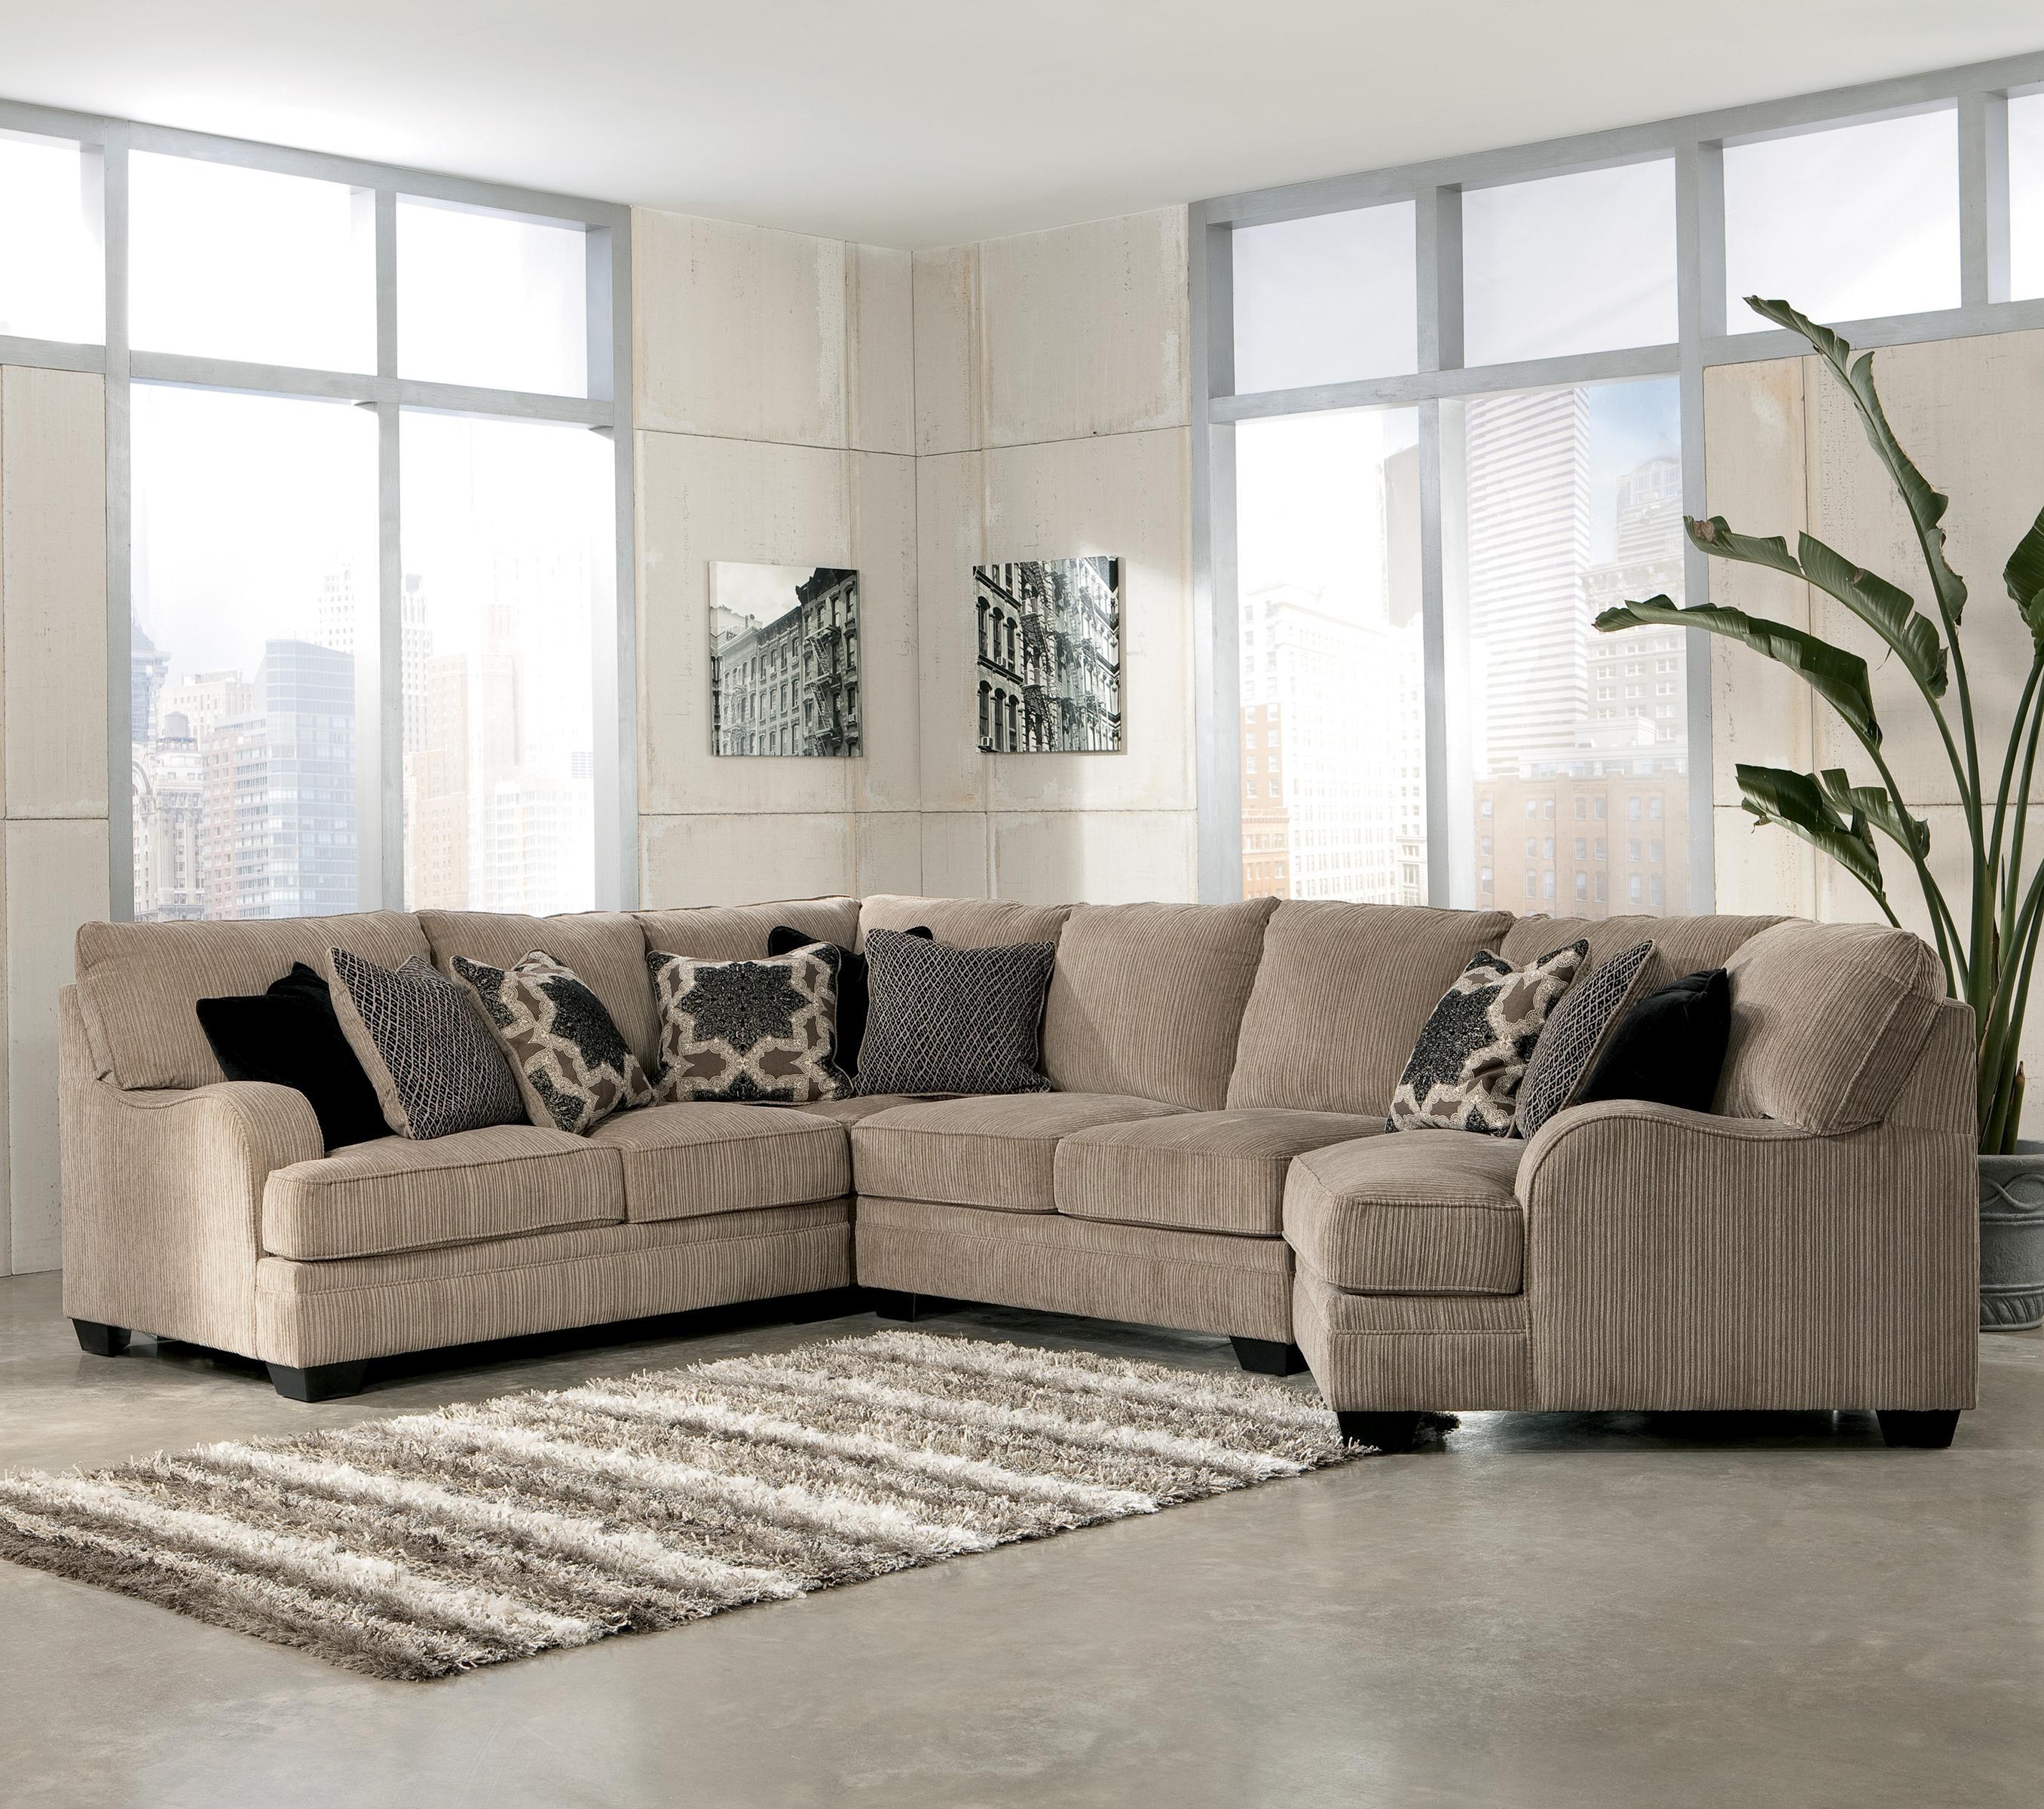 Signature Designashley Katisha - Platinum 4-Piece Sectional Sofa throughout Blaine 4 Piece Sectionals (Image 25 of 30)